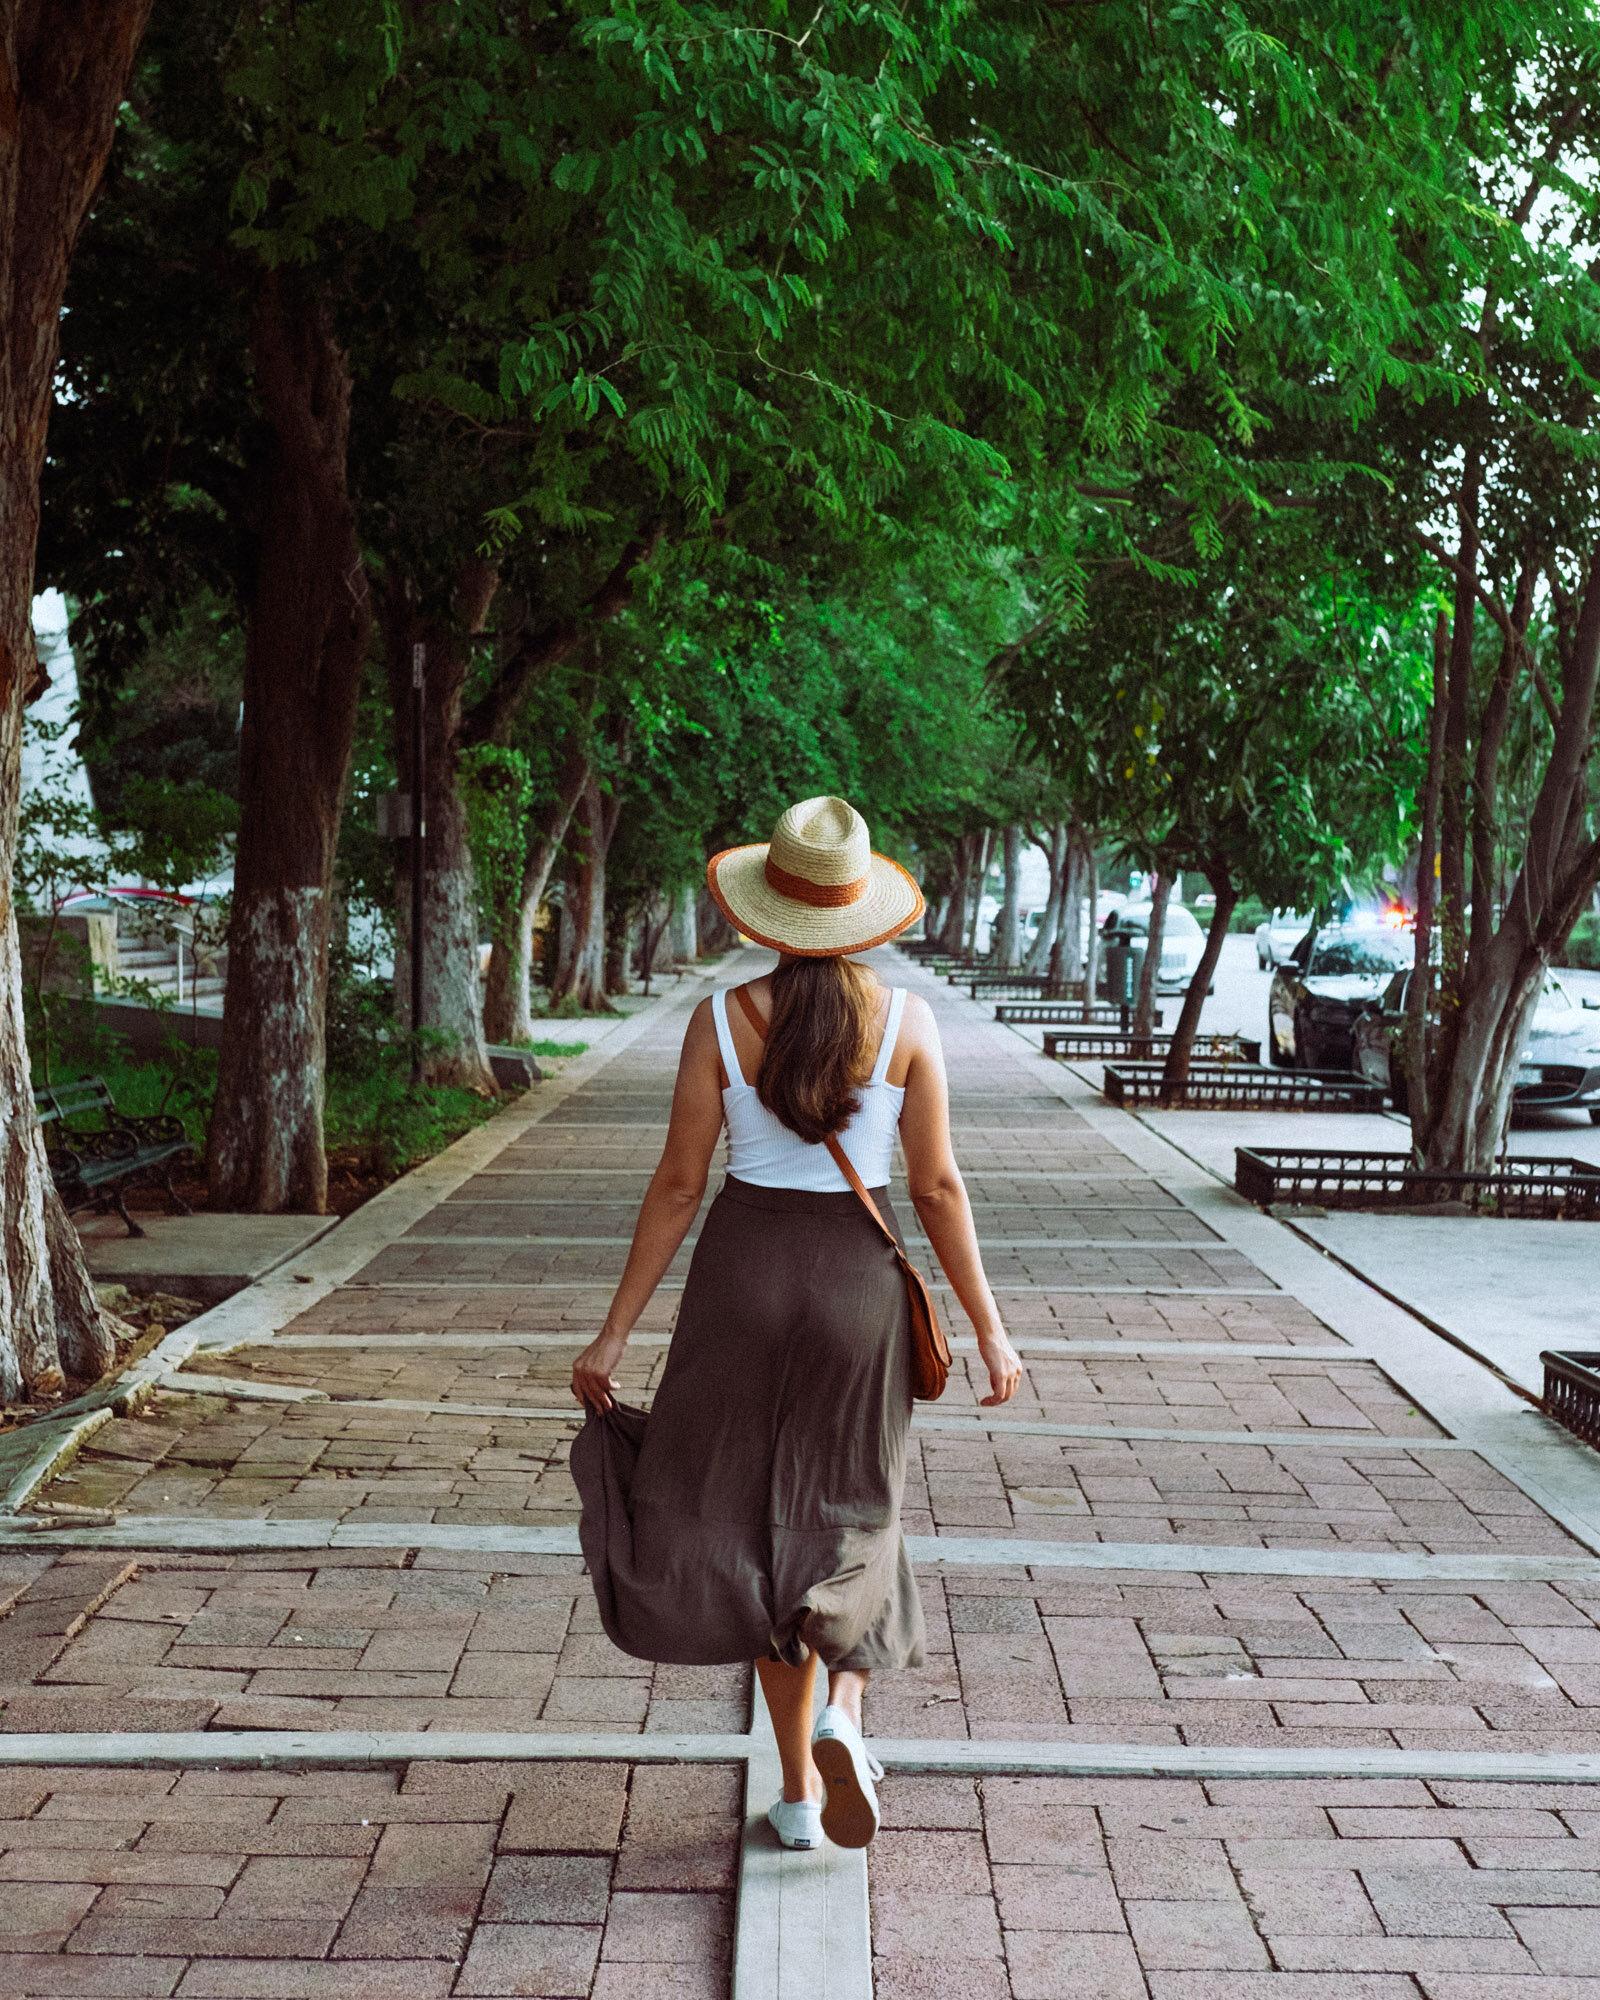 Rachel Off Duty: Woman Walking down a Sidewalk in Merida, Mexico